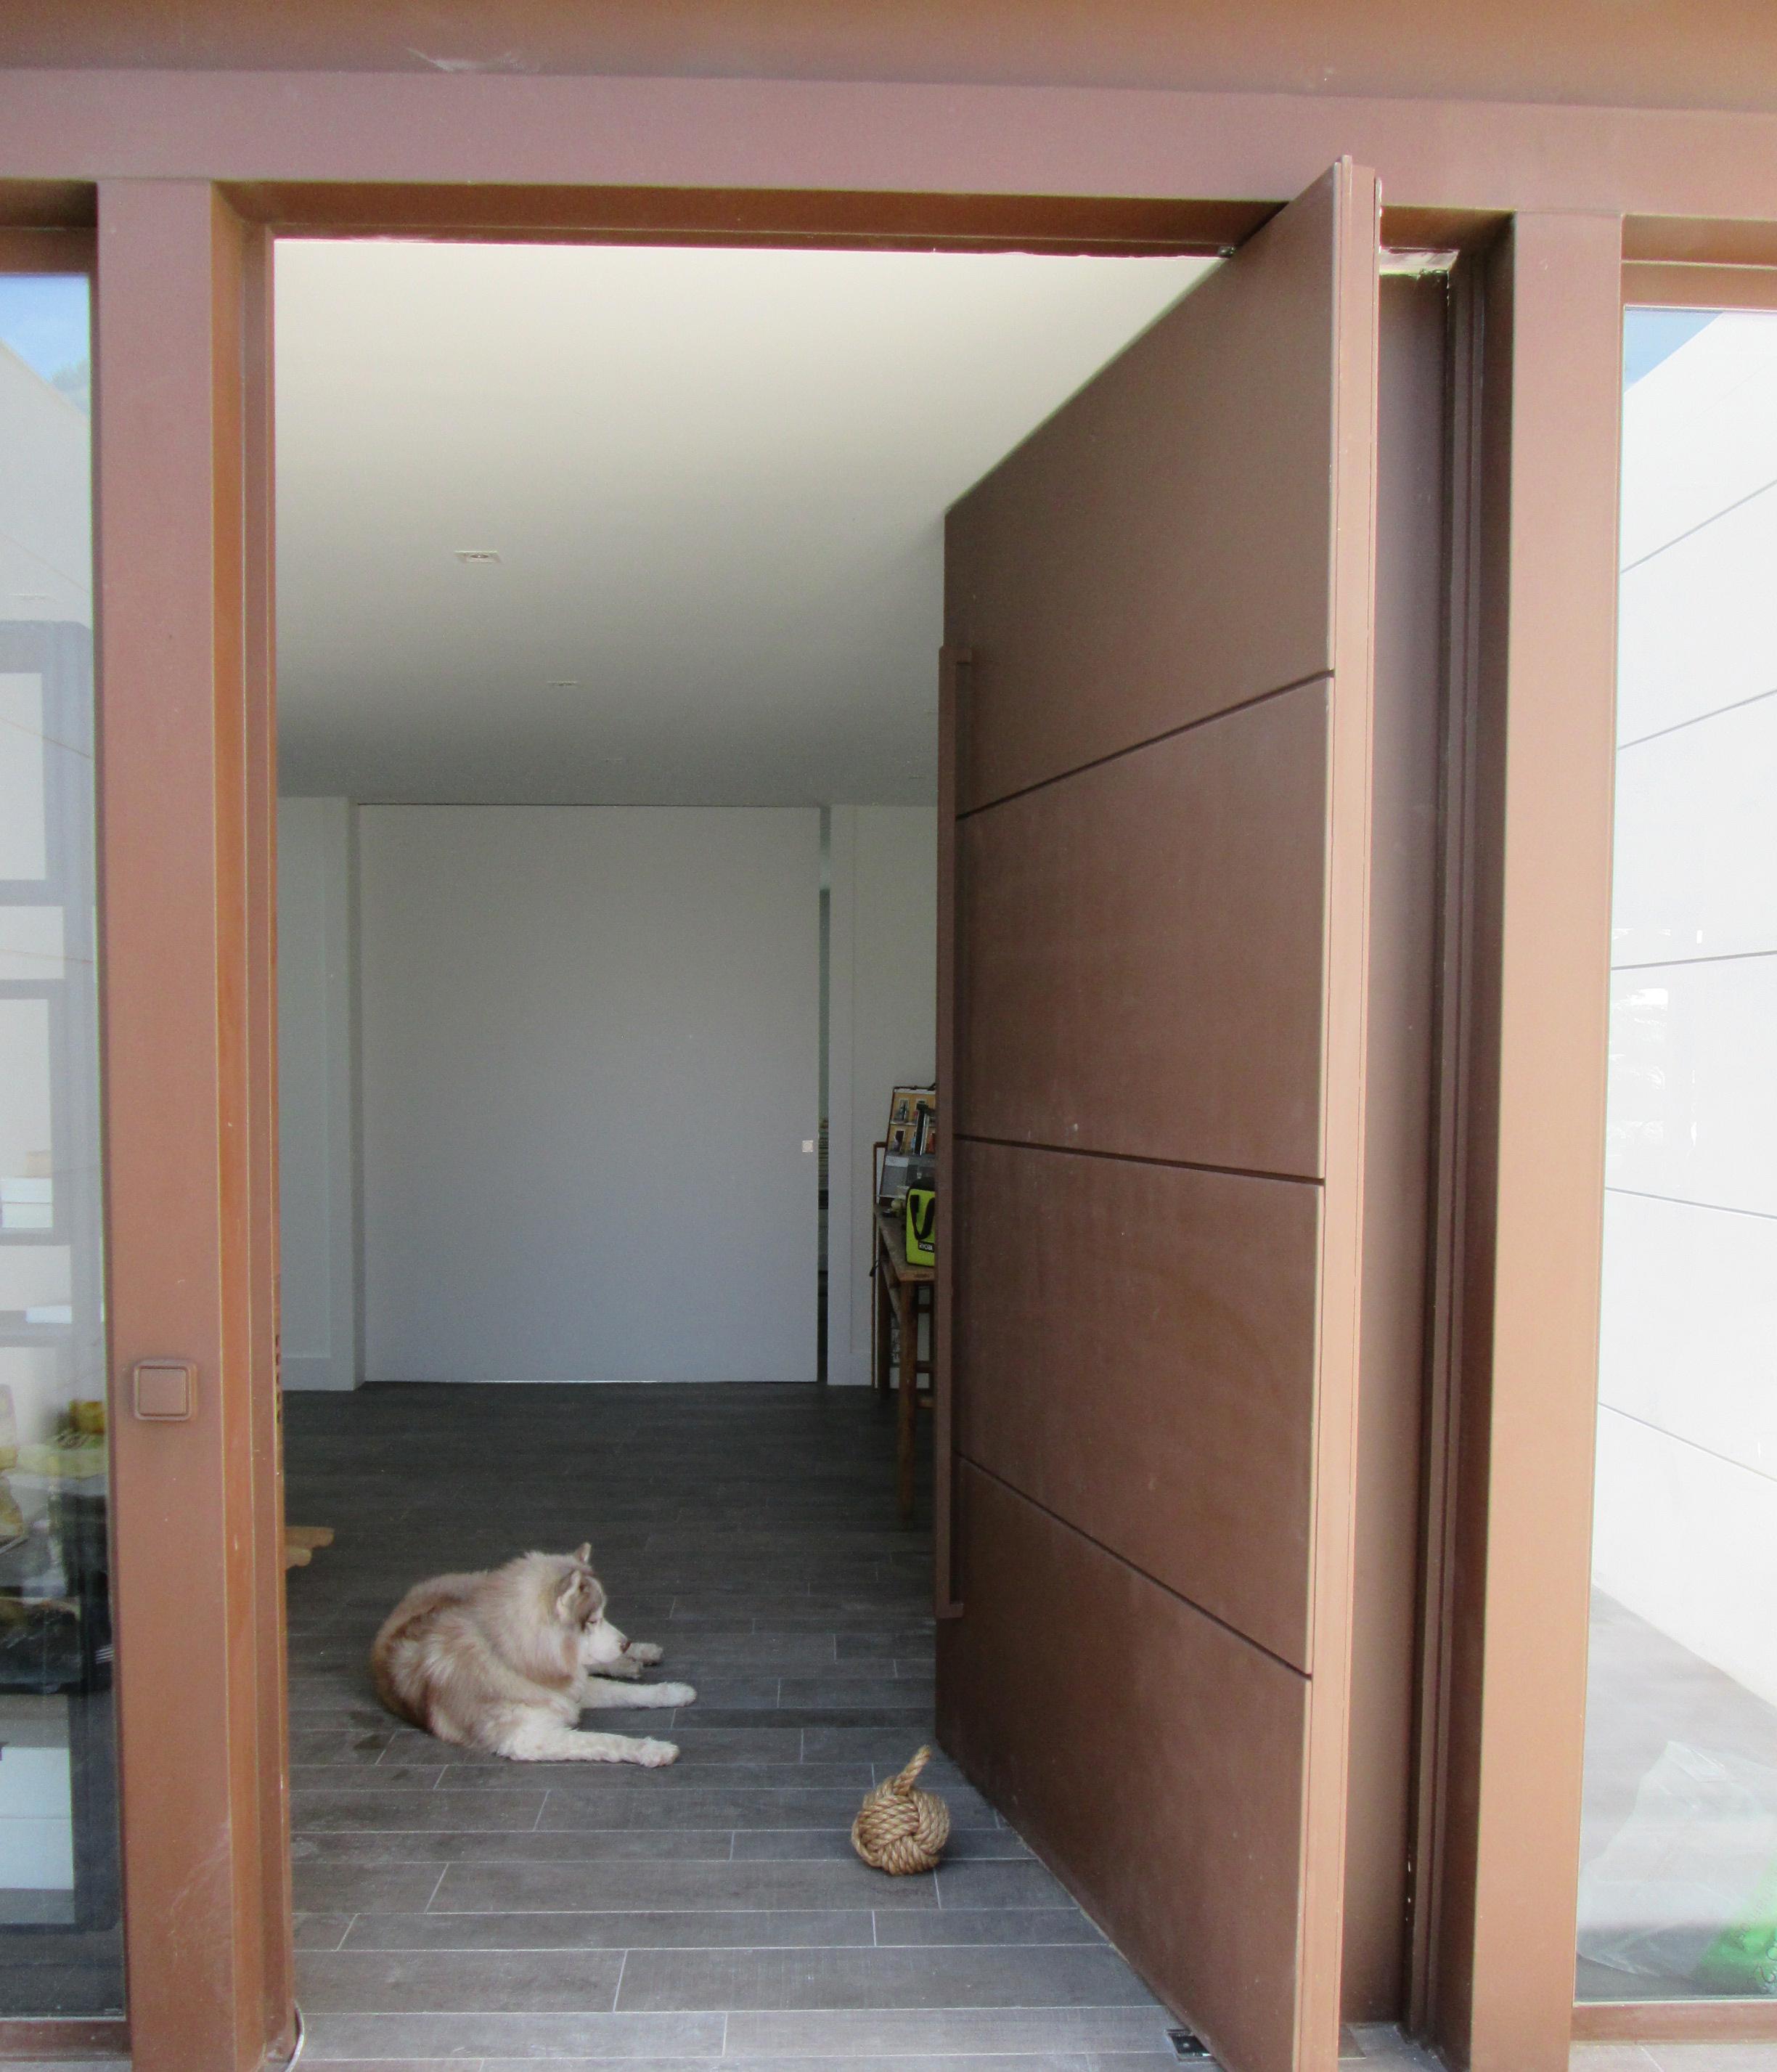 Puertas blindadas malaga free puertas de entrada puertas - Puertas blindadas malaga ...